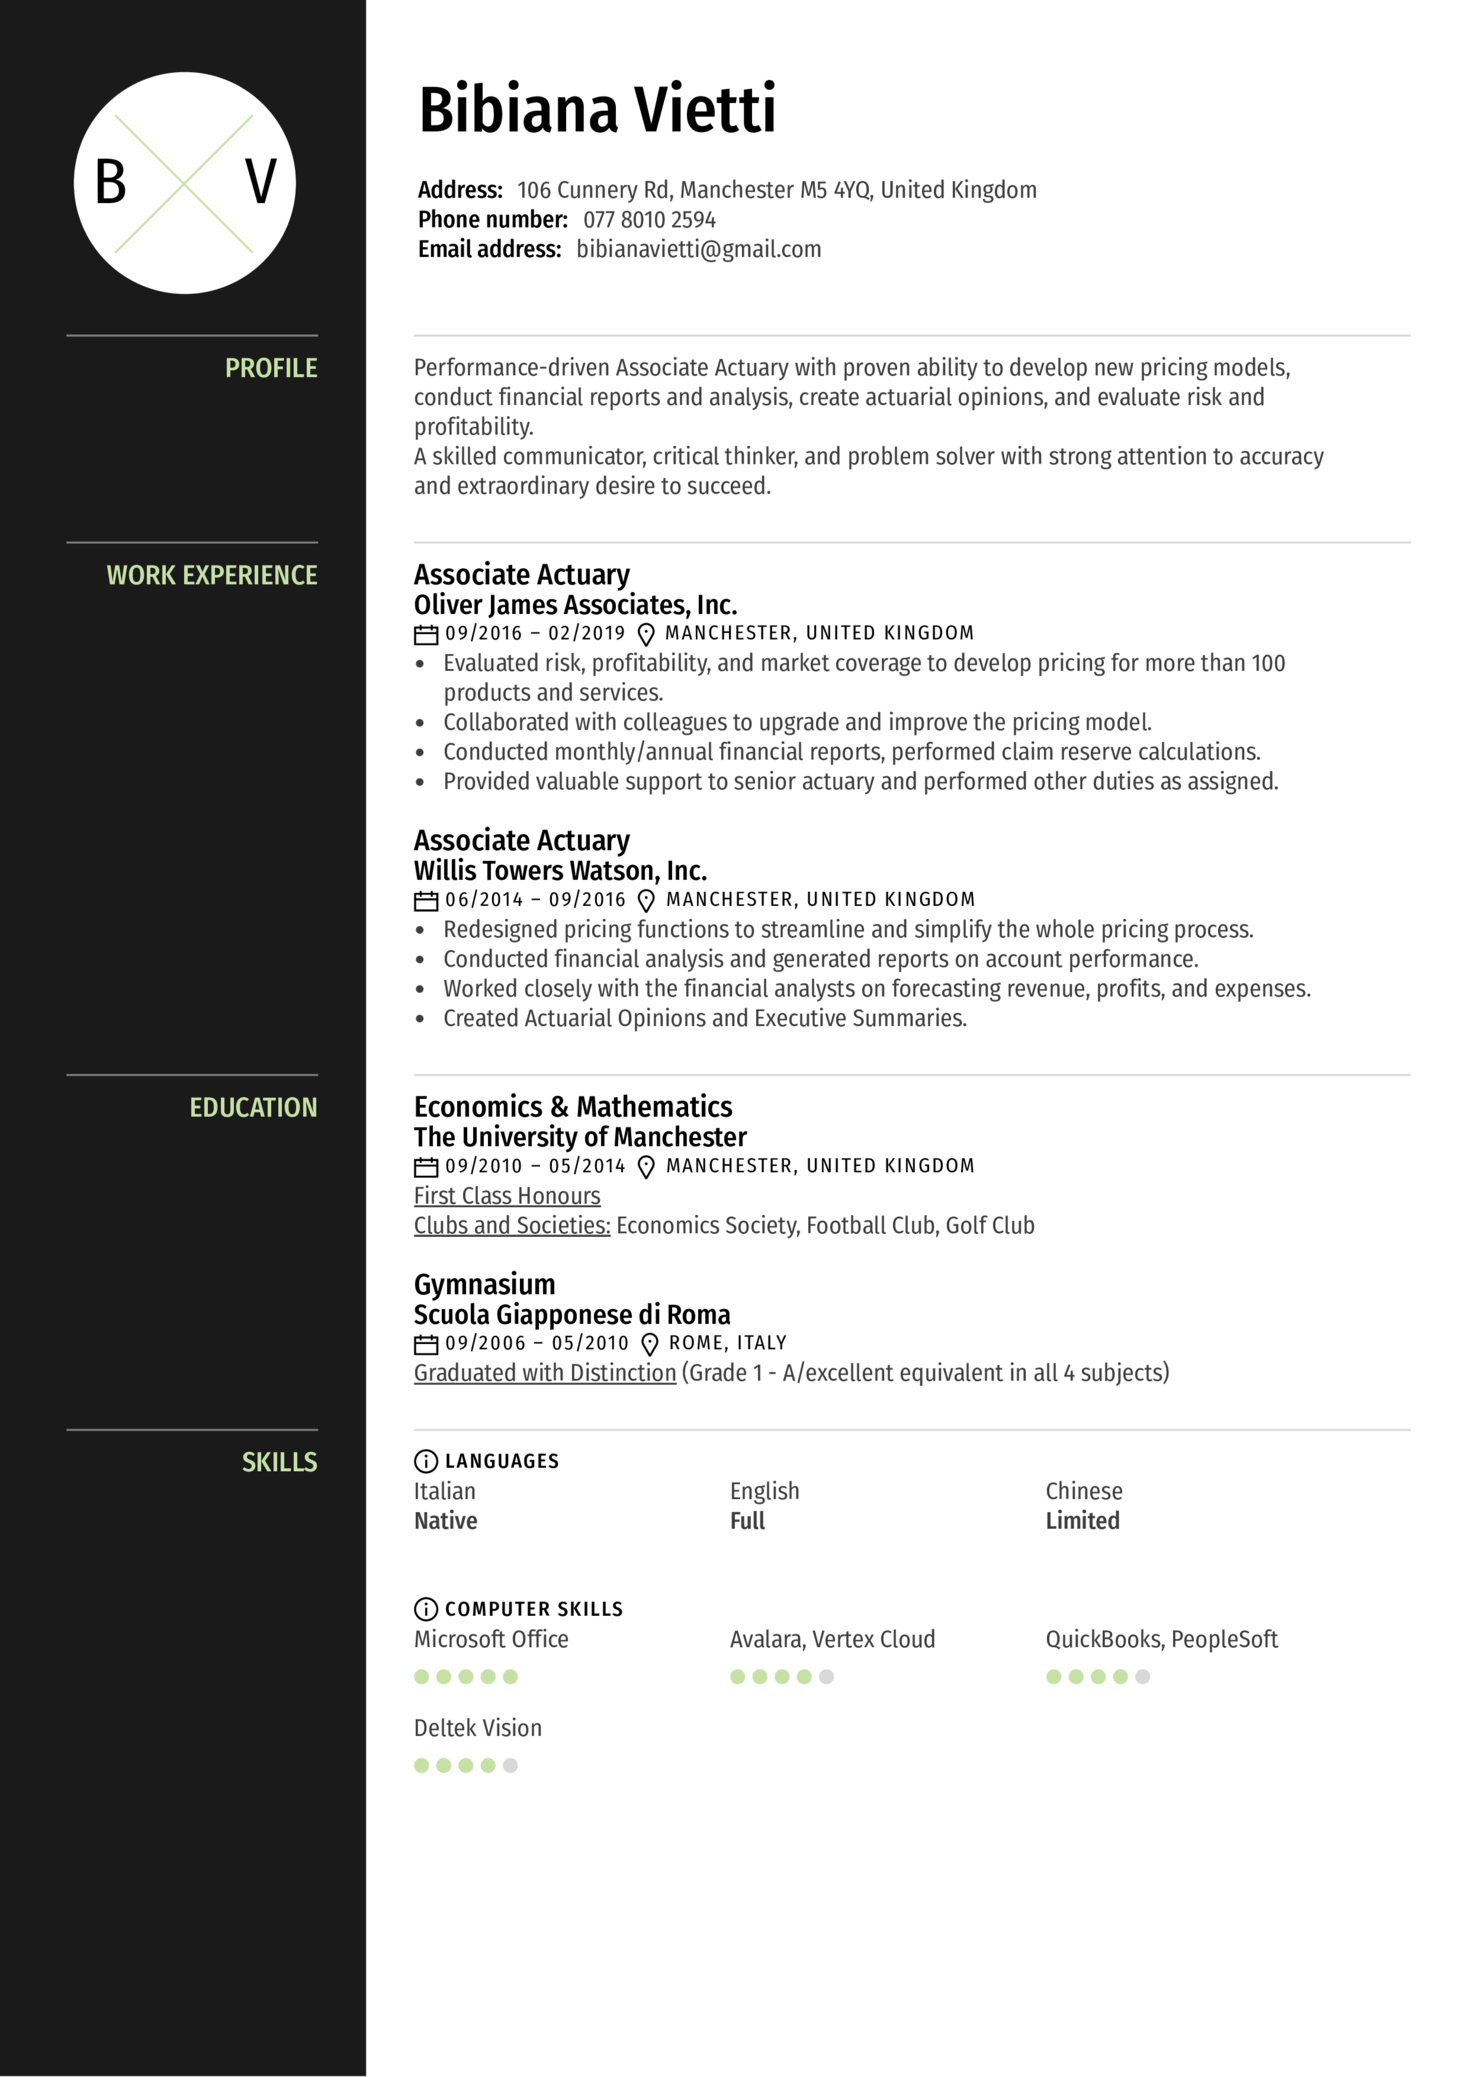 Associate Actuary Resume Example (Parte 1)